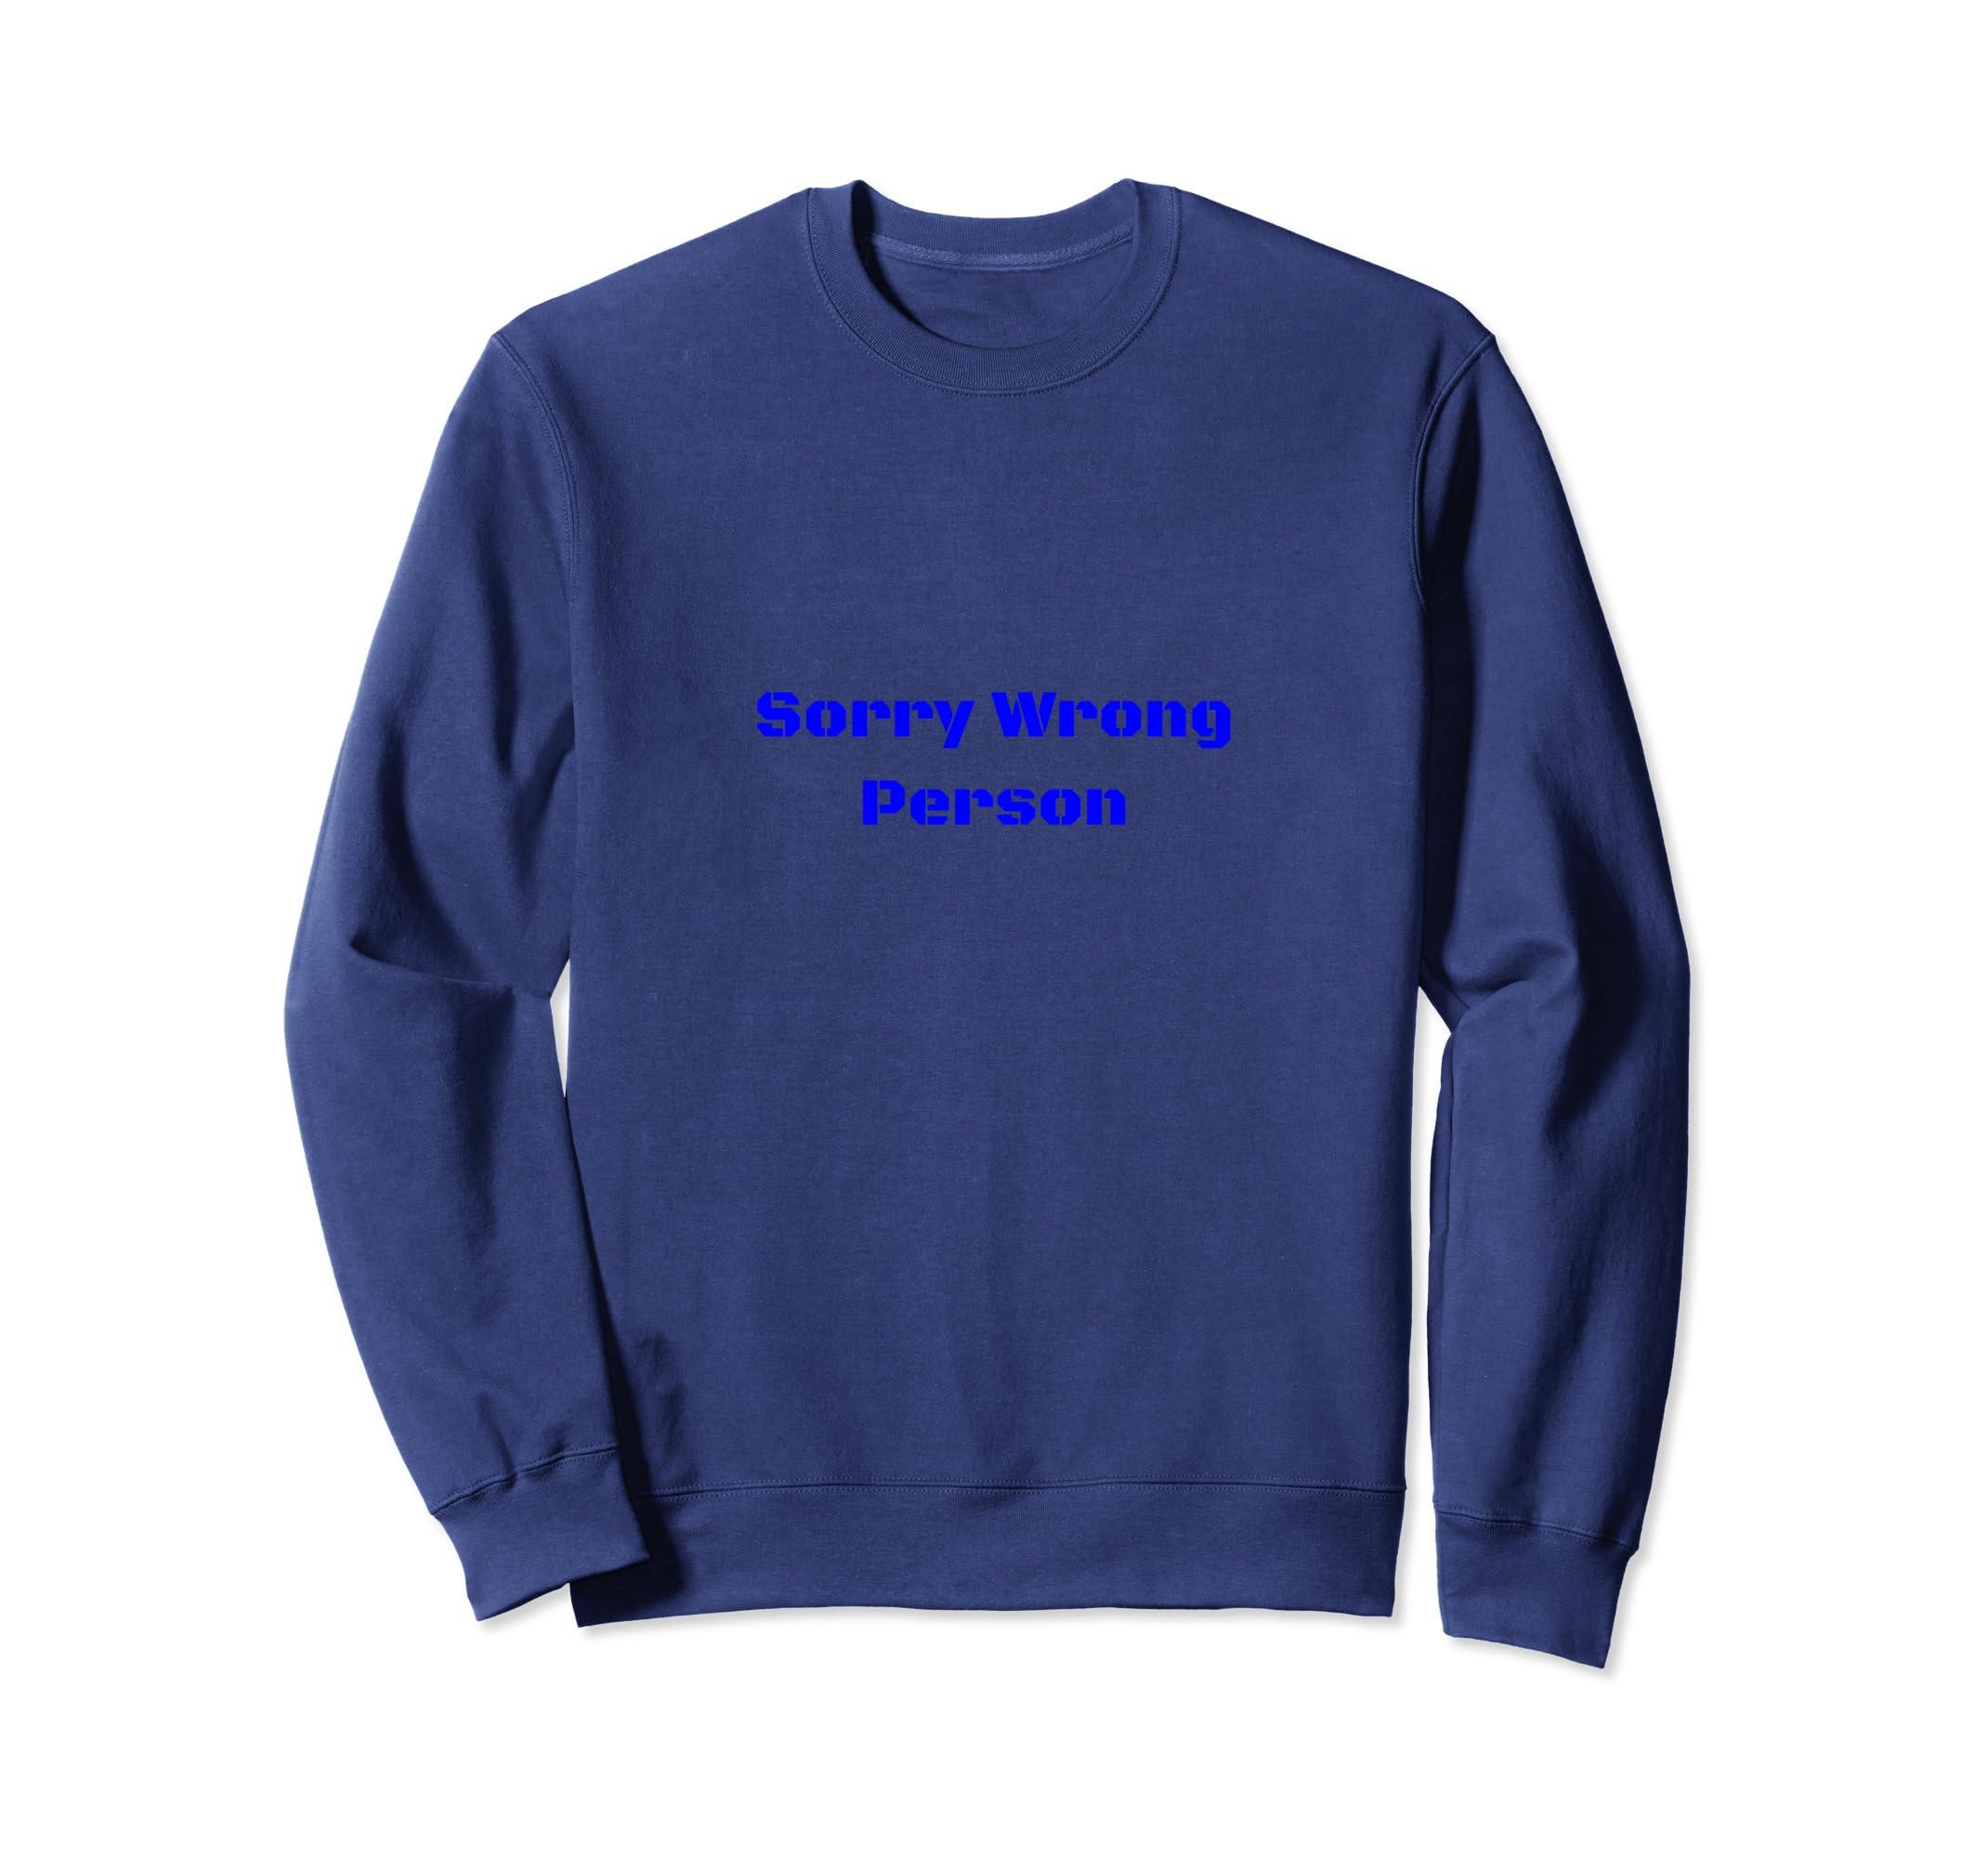 Amazon com: Sorry Wrong Person Sweatshirt Funny Embarrassing